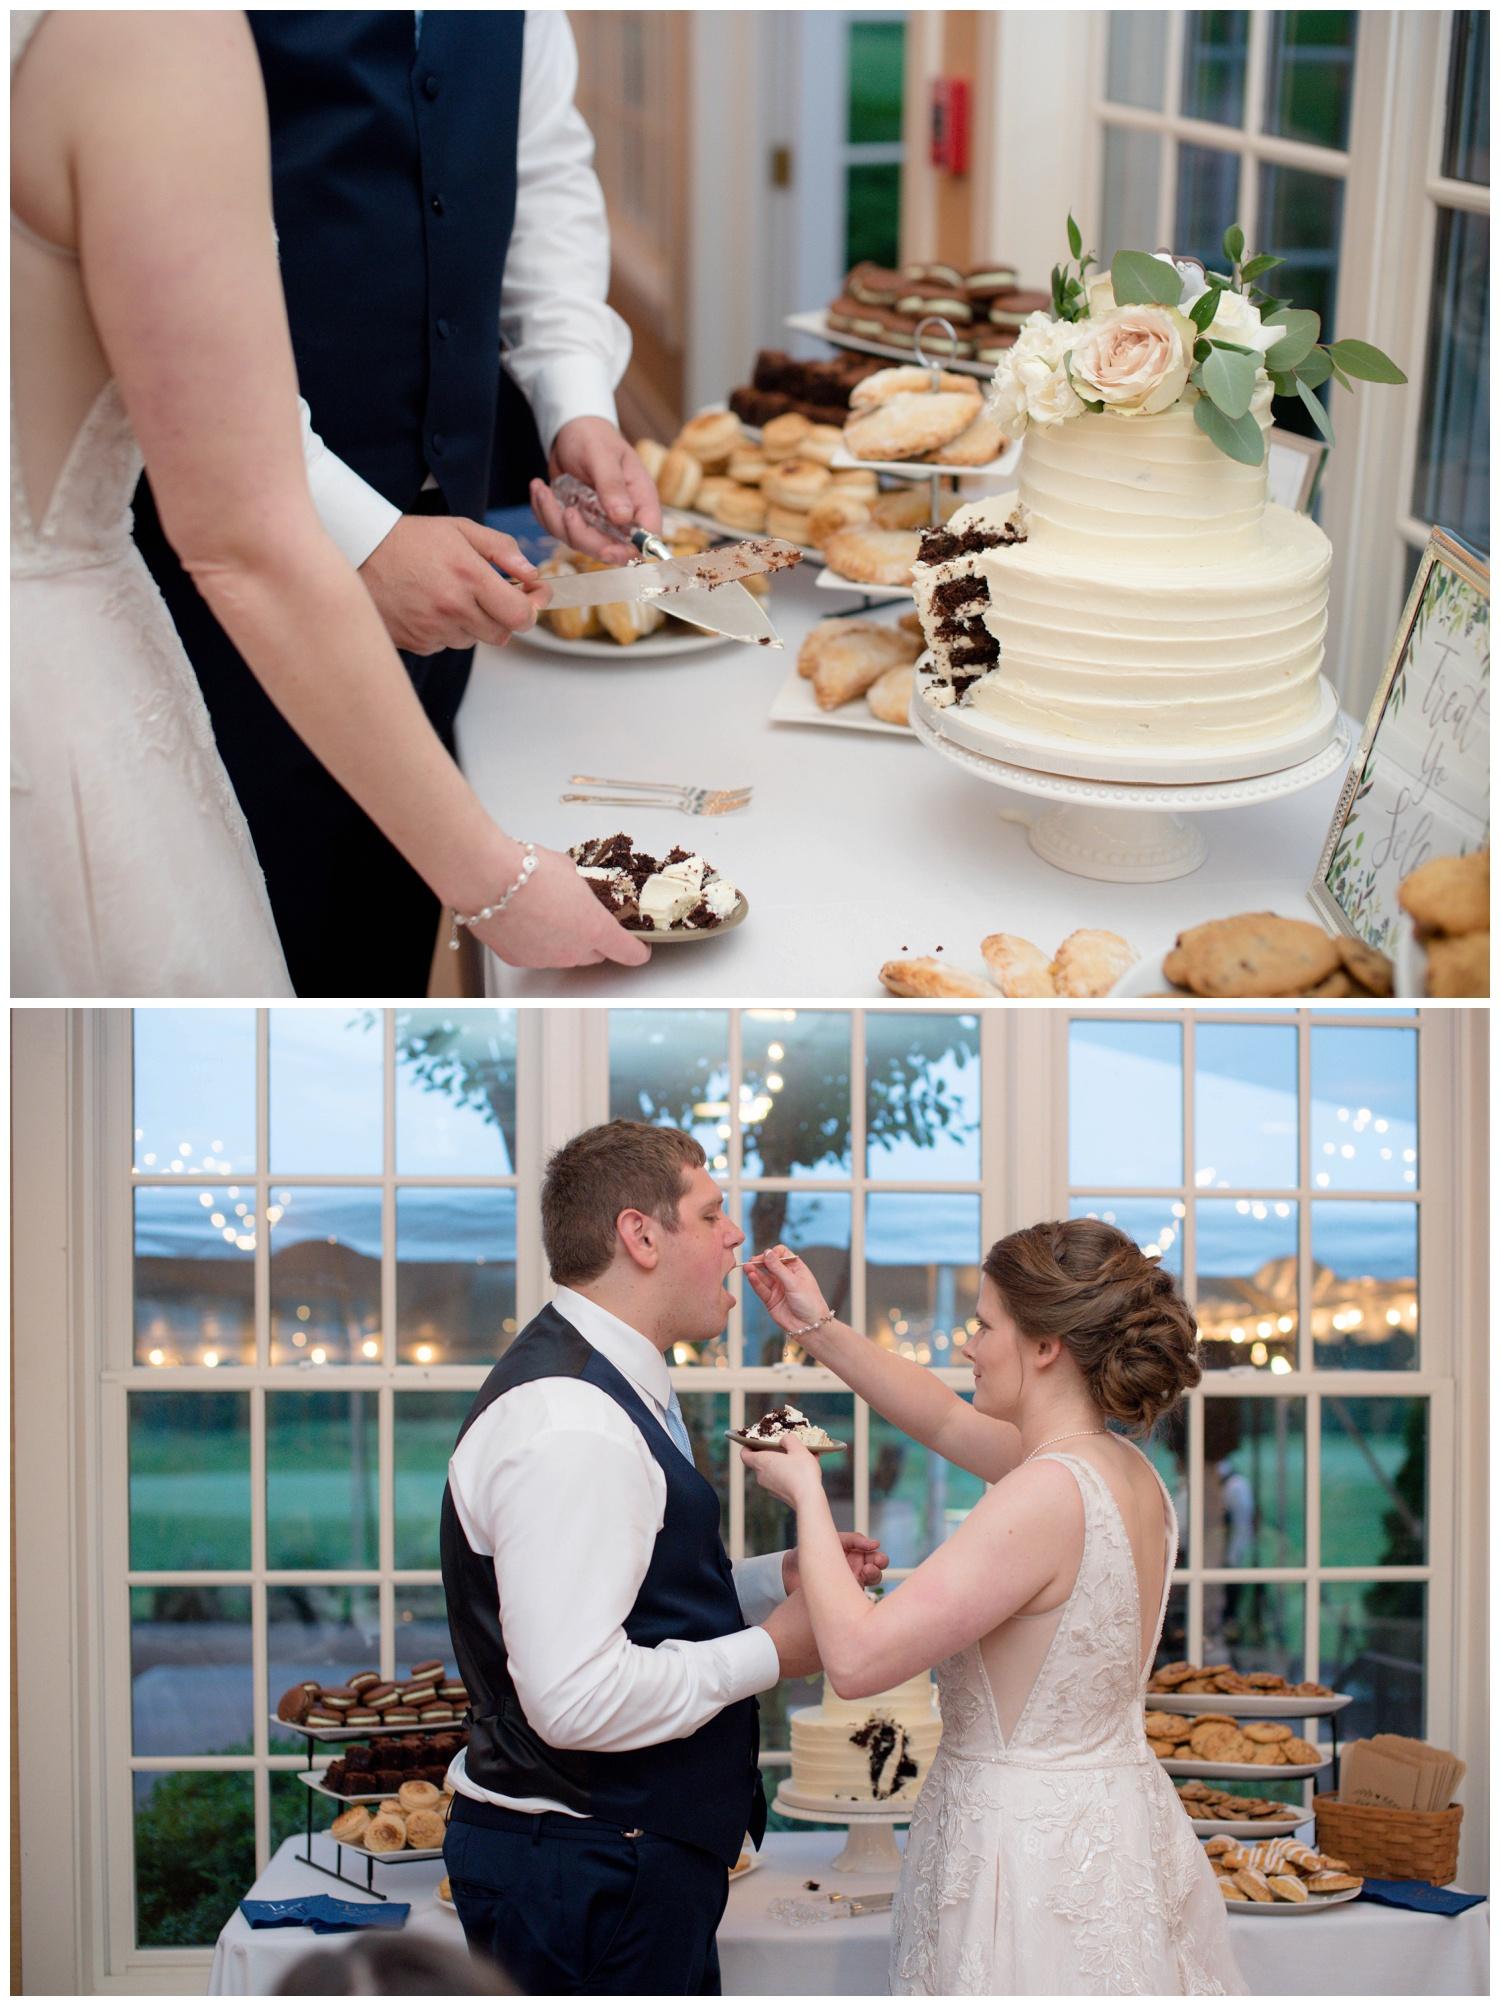 blue-ridge-wedding-ashley-nicole-photography-restoration-hall-crozet-06-11_0023.jpg